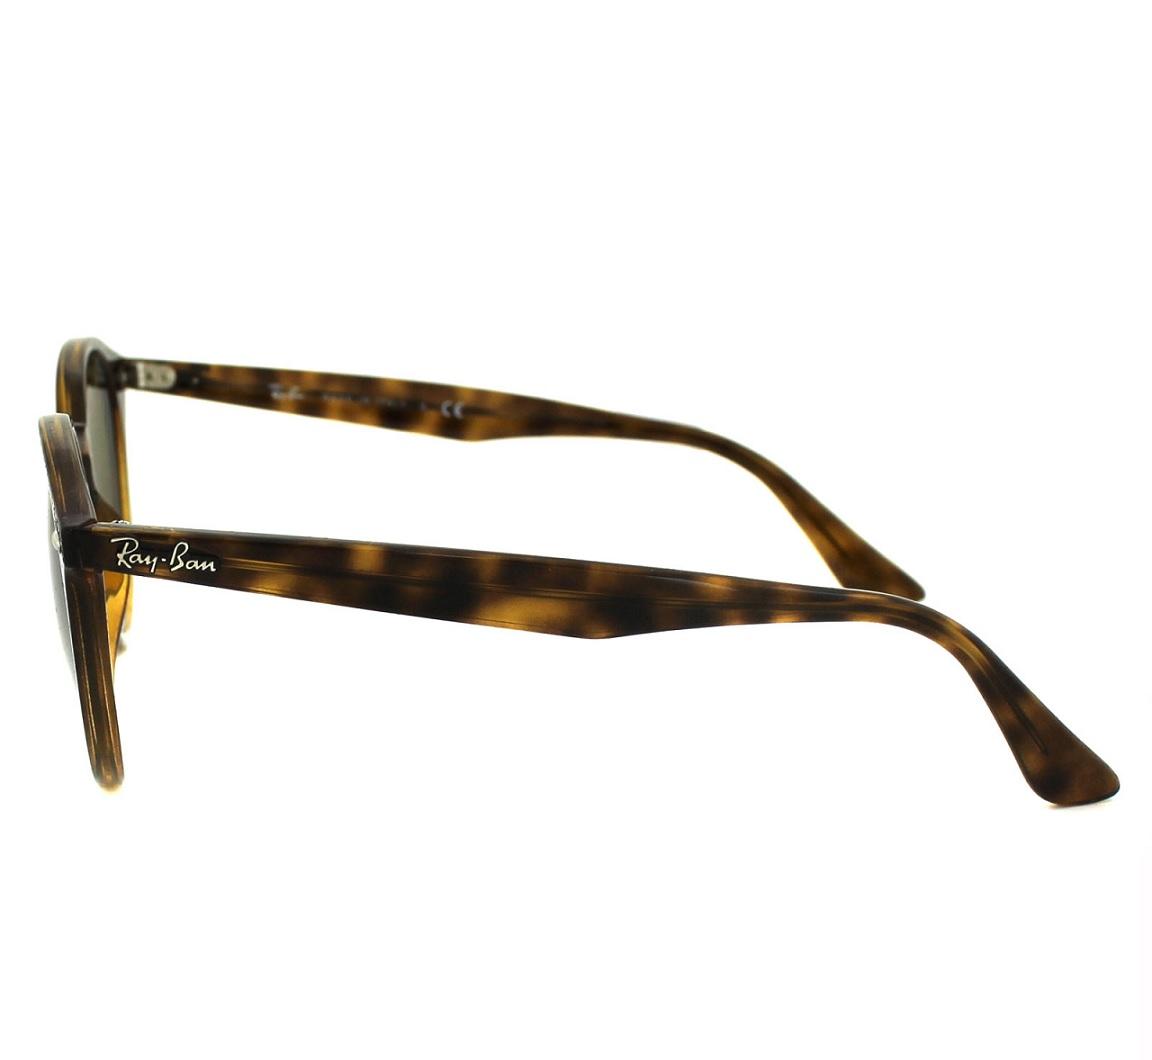 56280853ed855 Ray Ban RB2180 710 73 Round Stylish Óculos de Sol - Óticas Totus